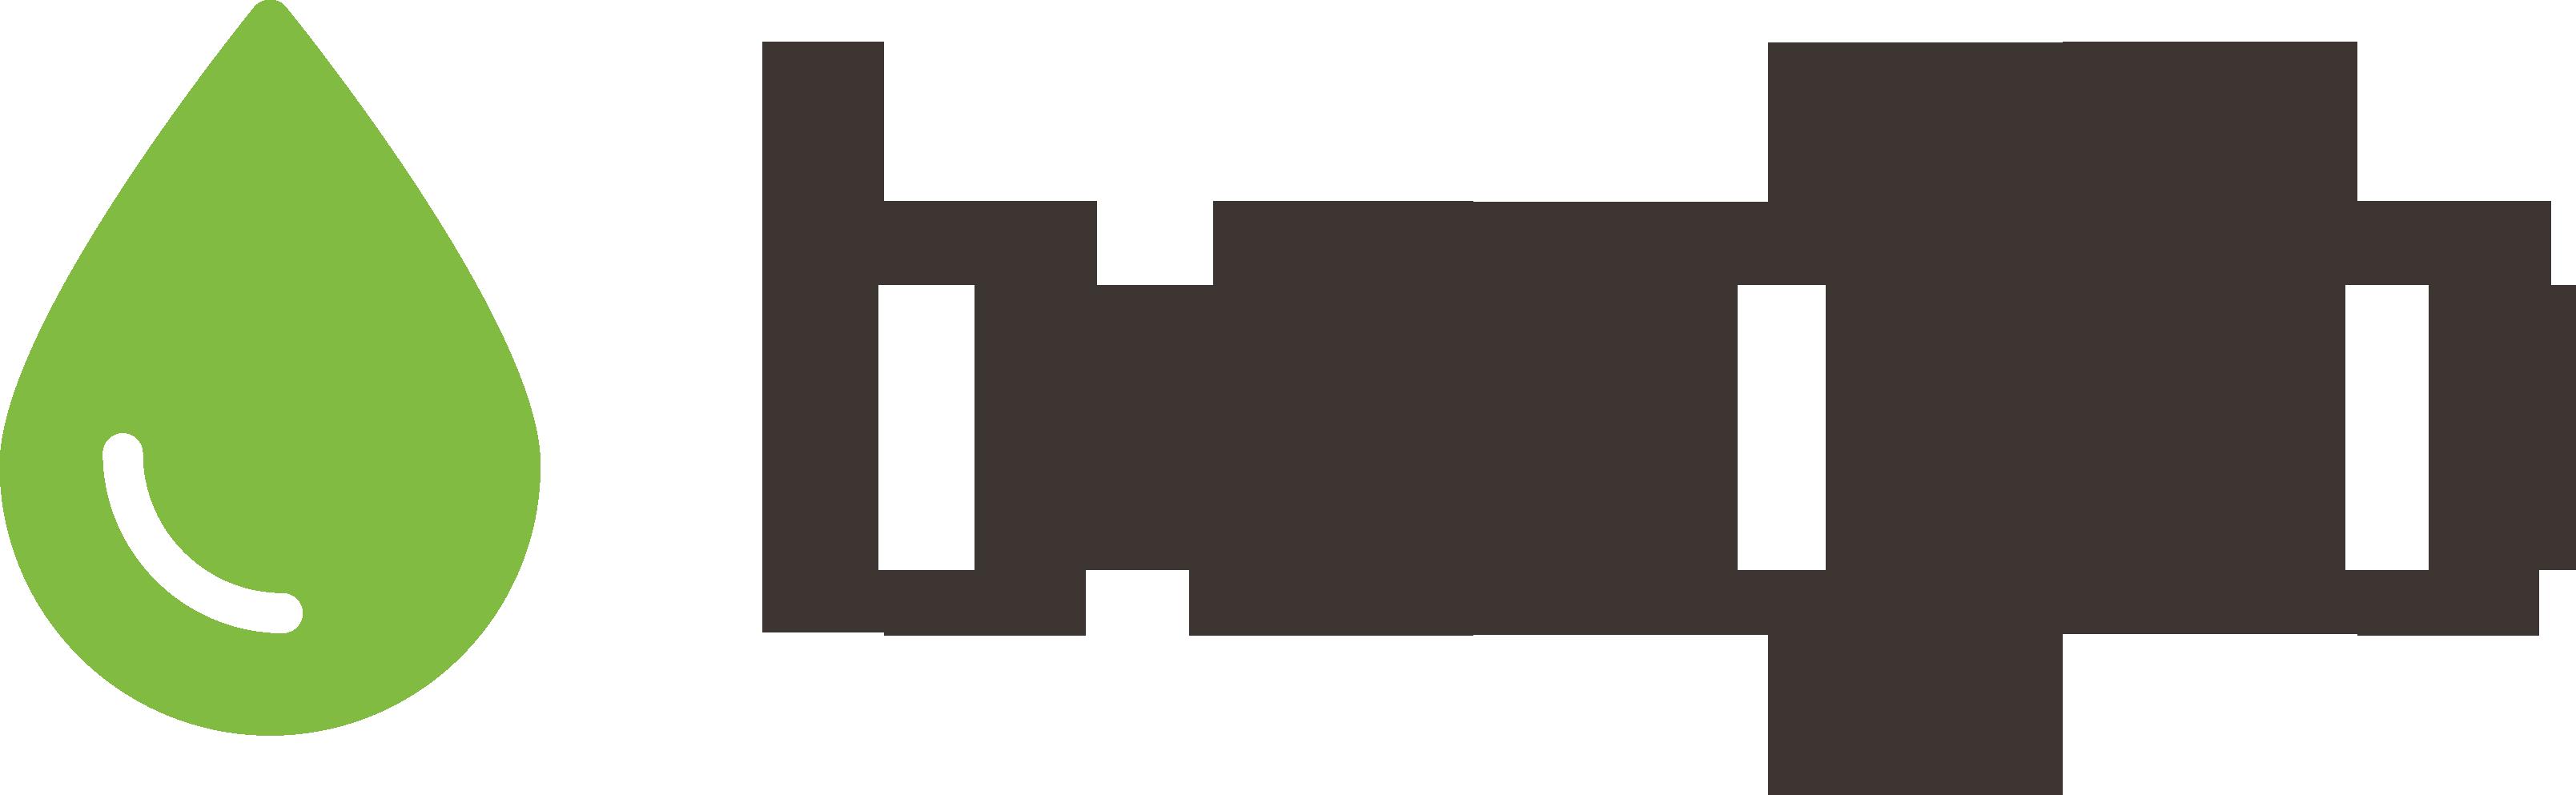 Logo Baqio (ex Vinosoft)